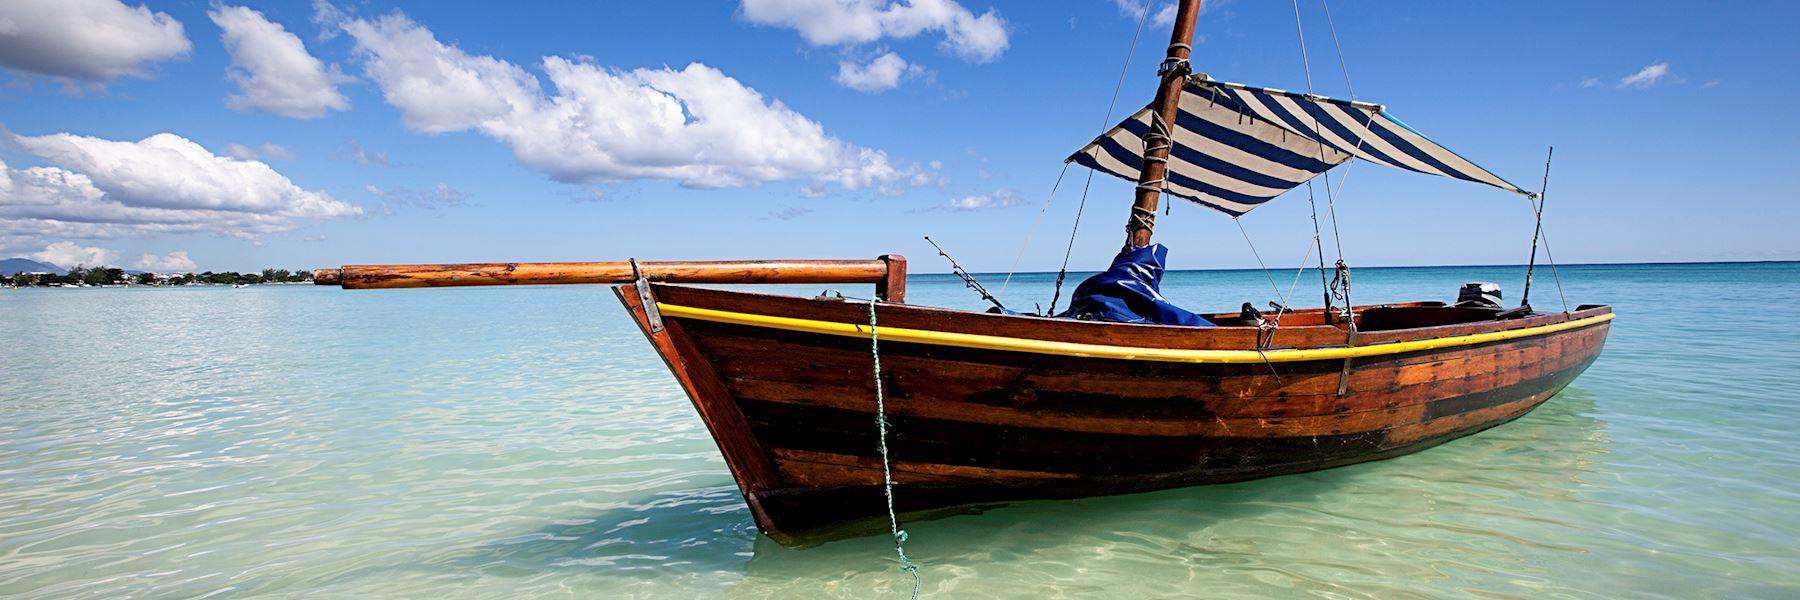 Mauritius vacations & honeymoons